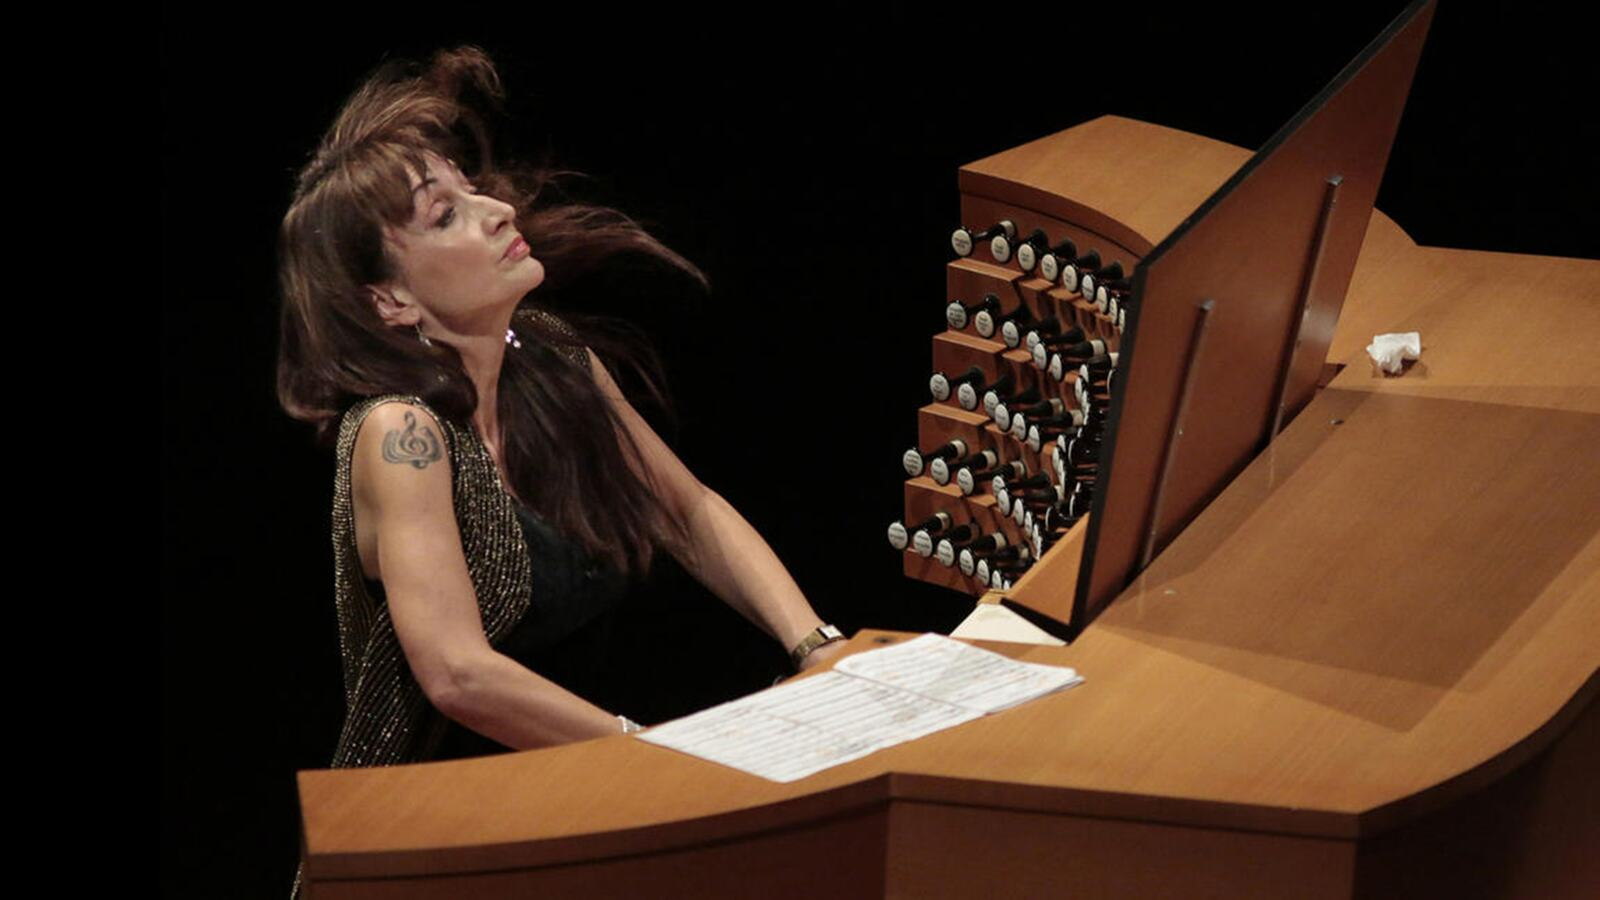 Carol Williams playing the organ